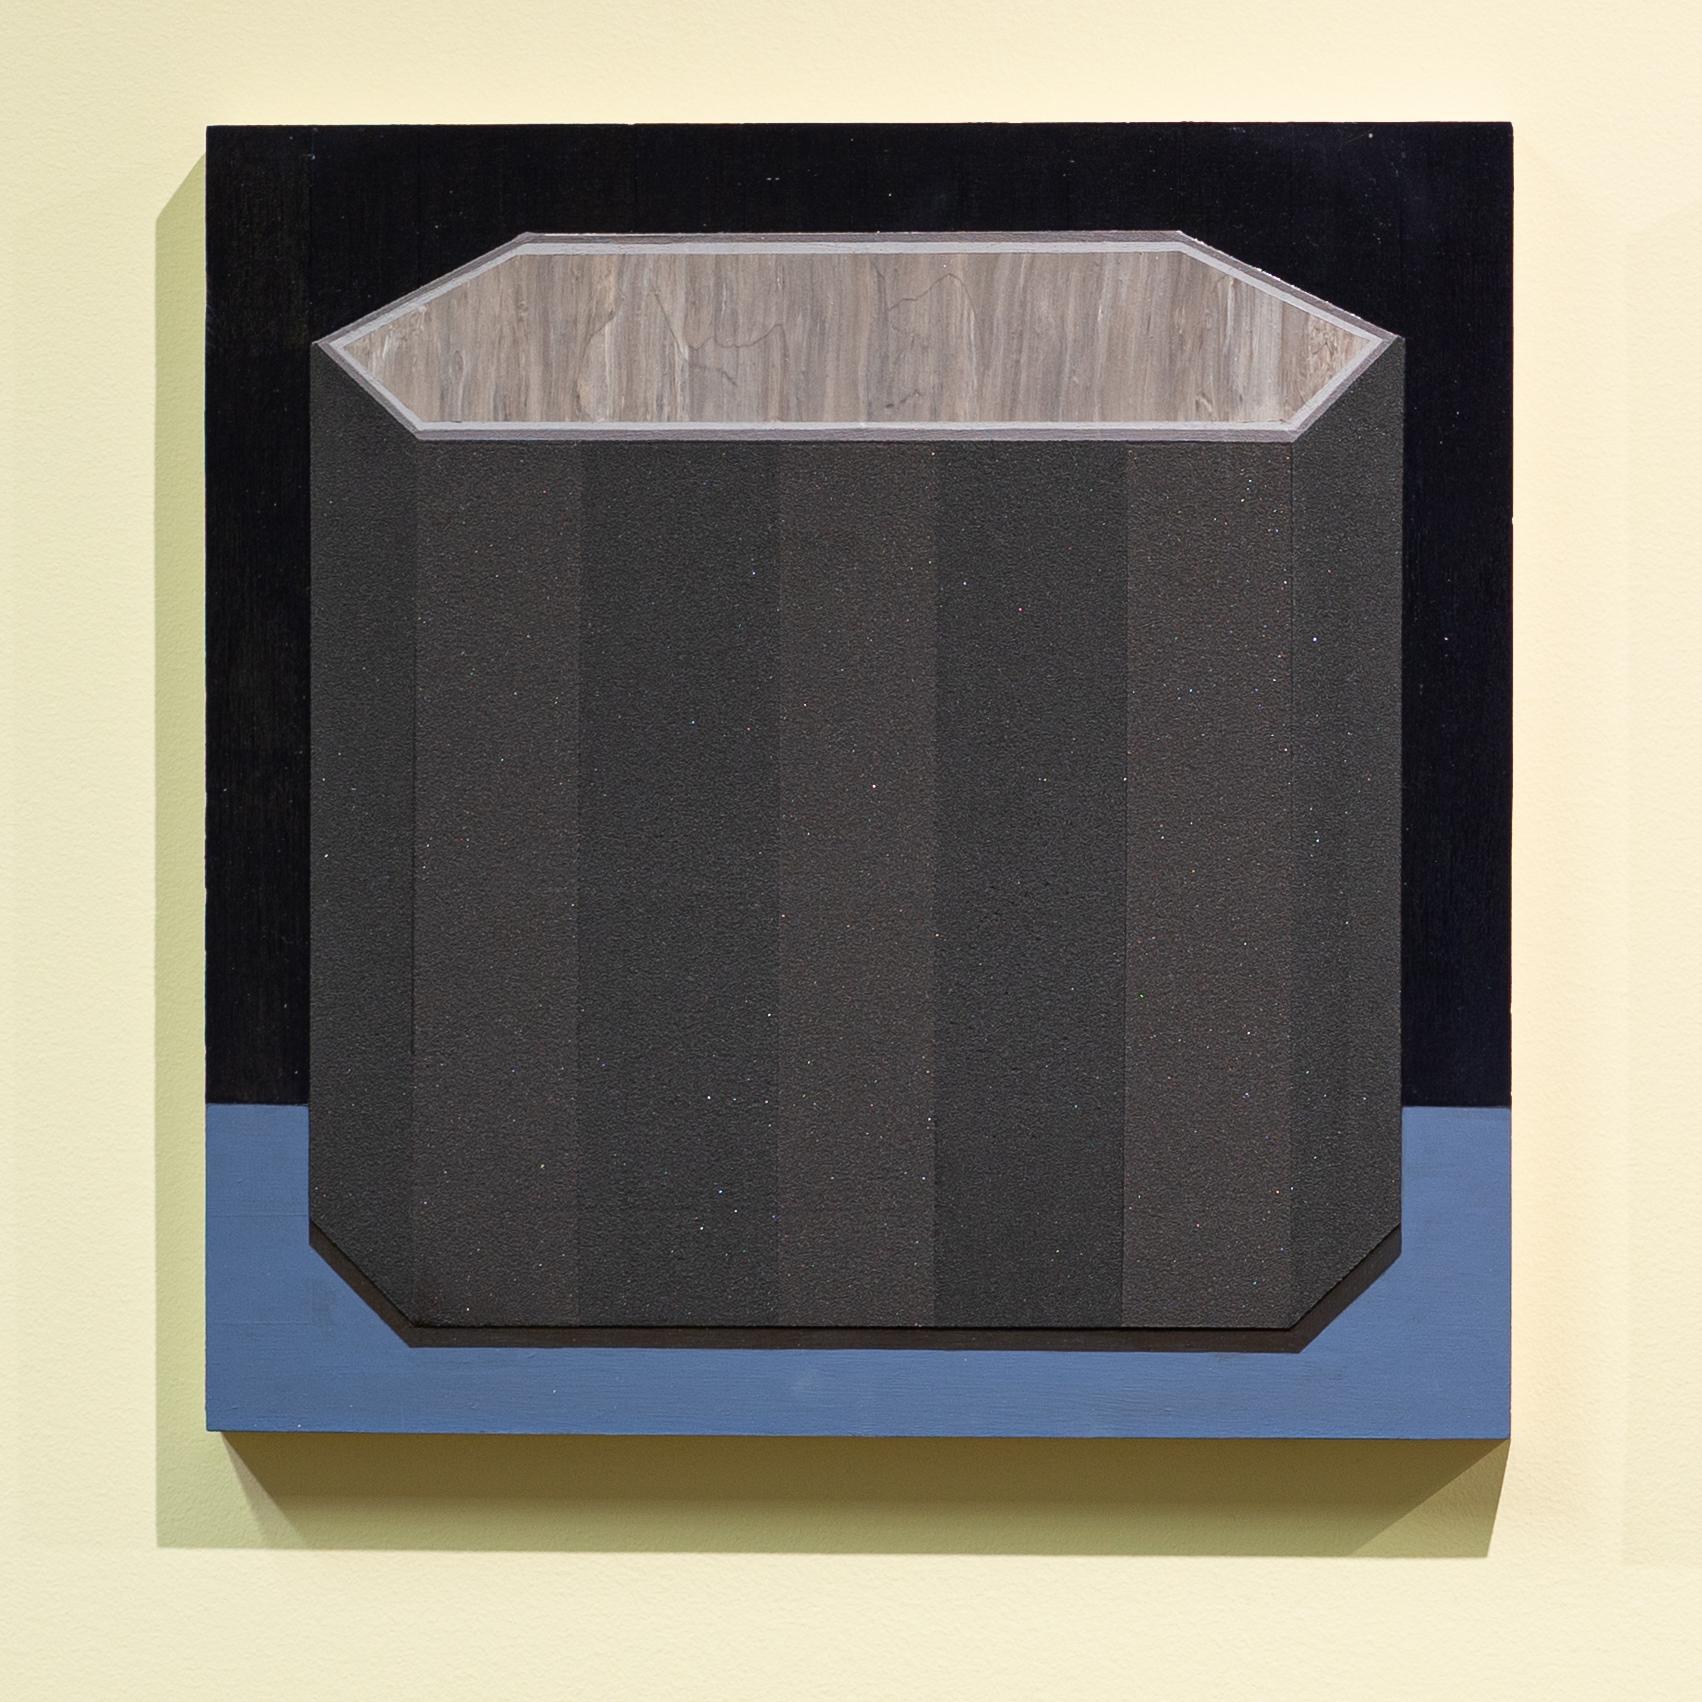 "Mary Laube, Urn, 12"" x 12"", acrylic on panel, 2018"